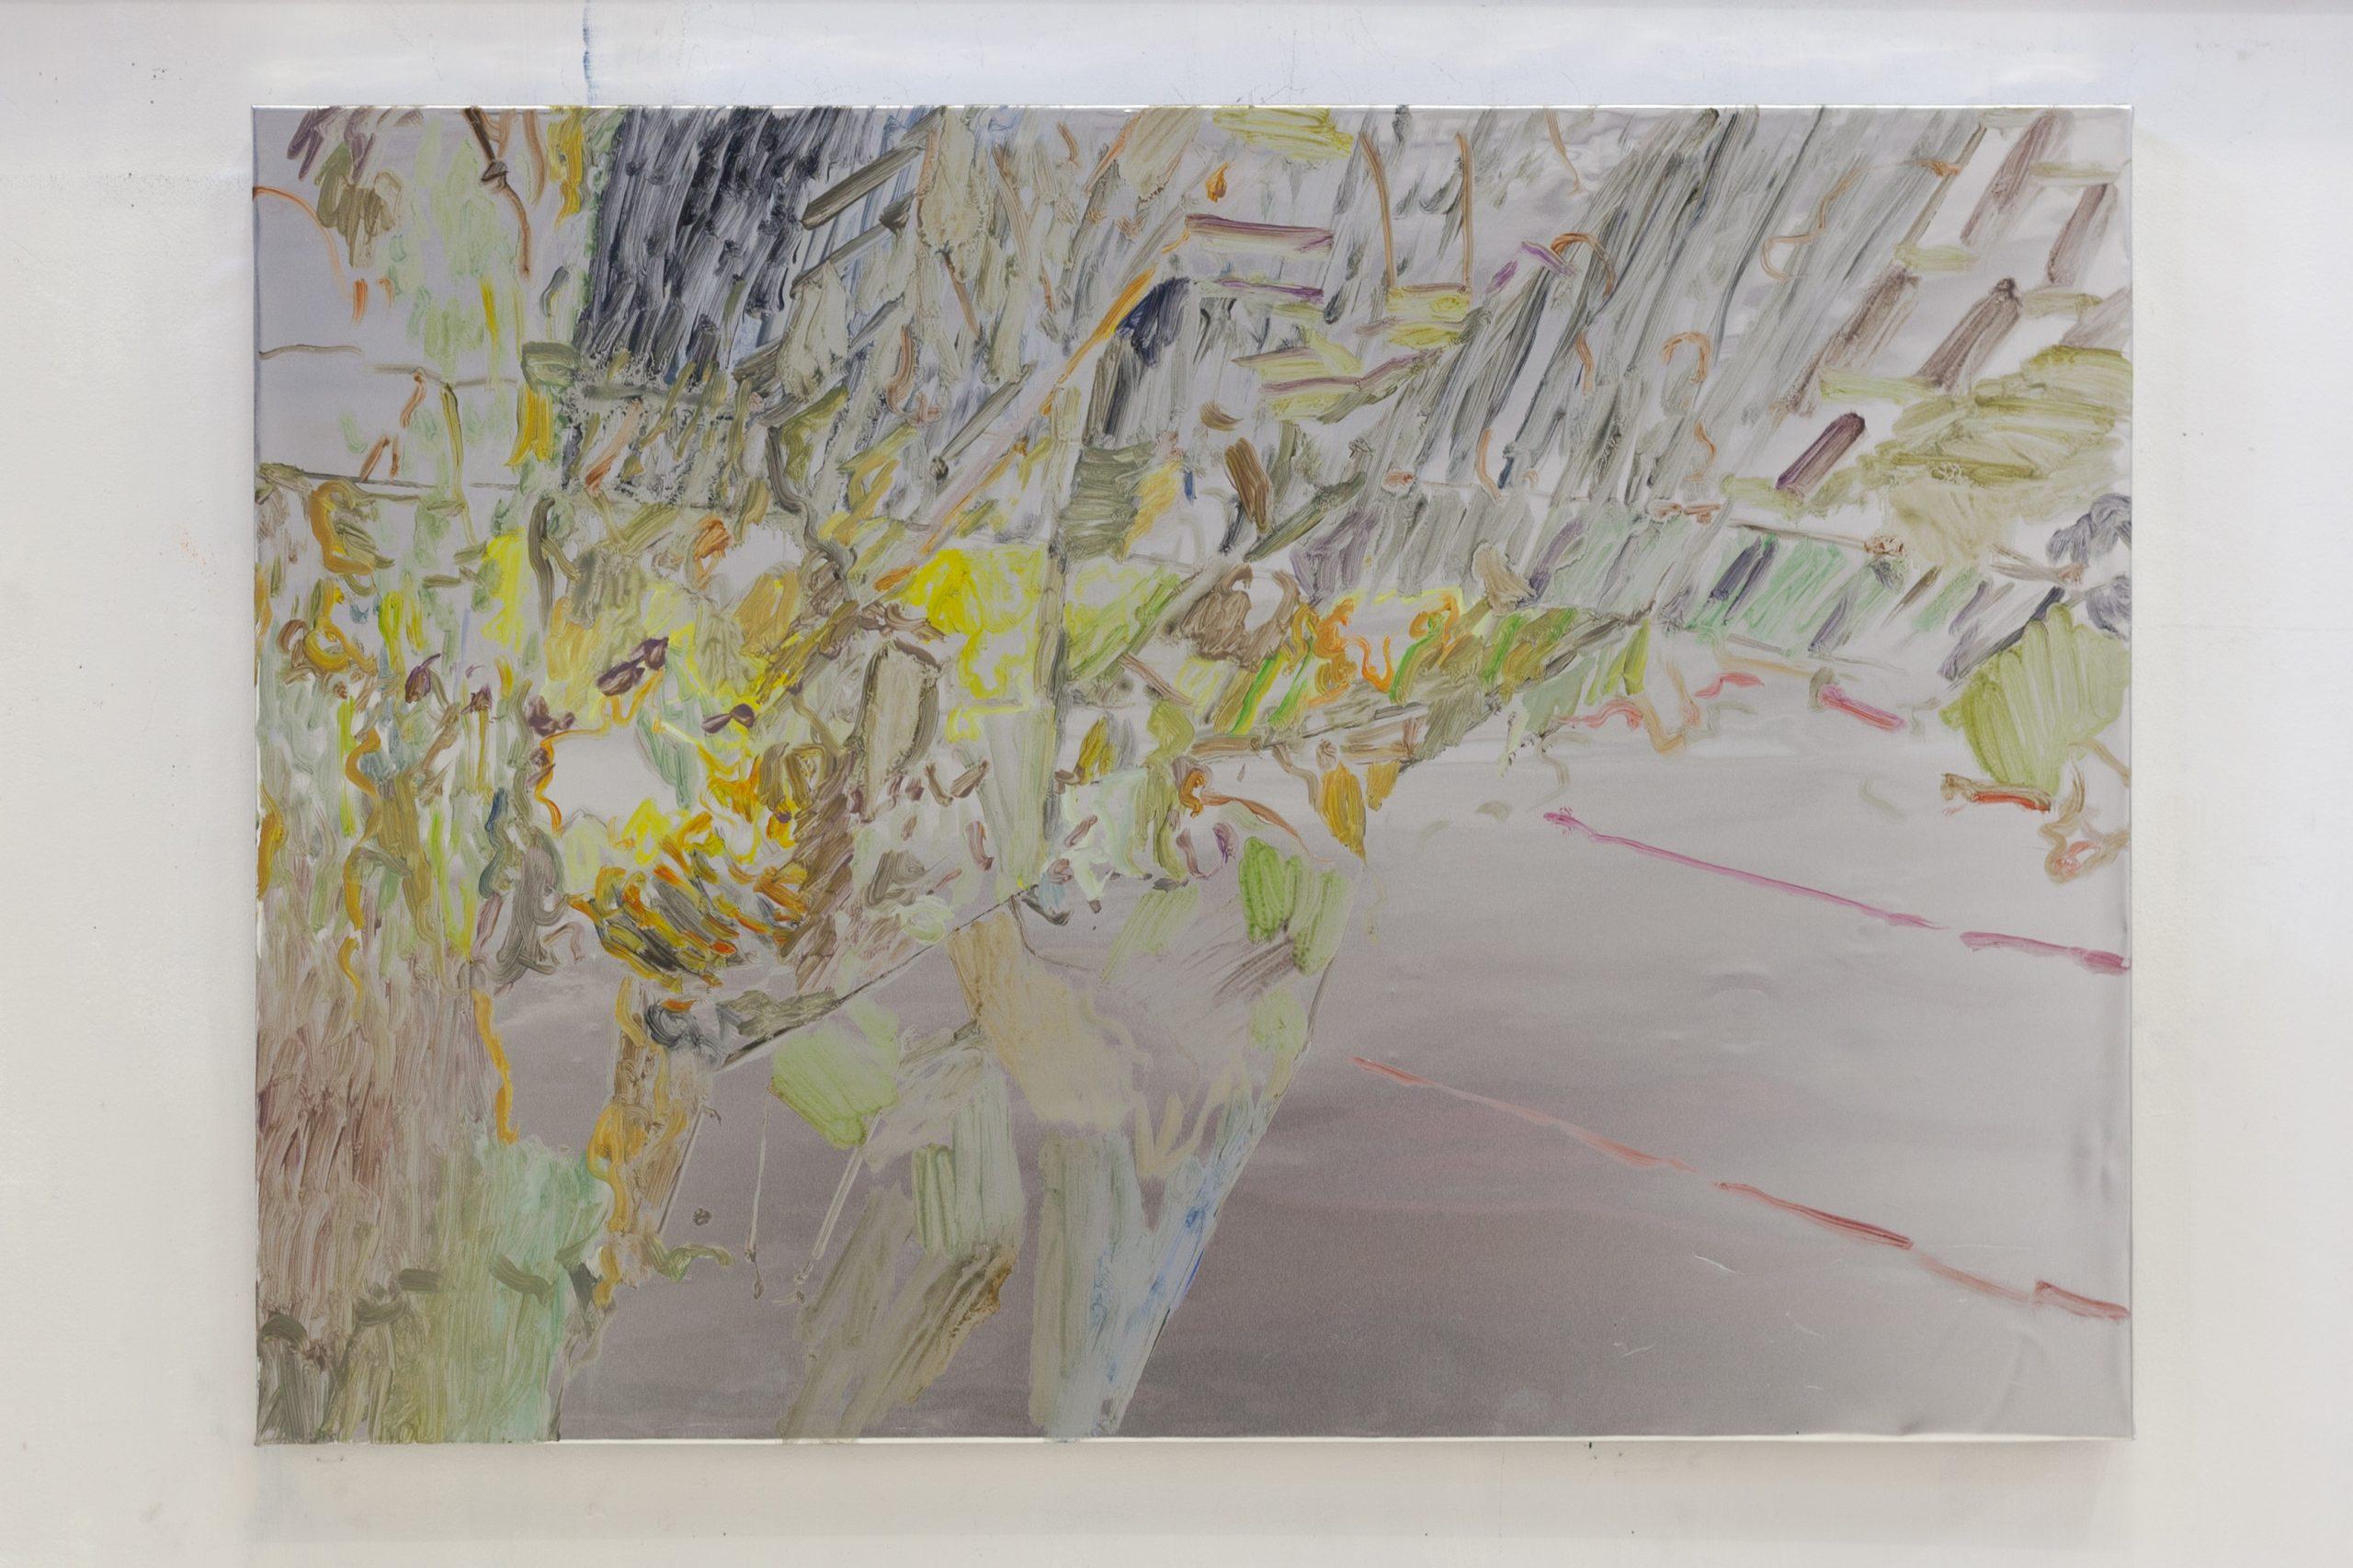 Henrik Eriksson, Utan titel (Goa 03), 2018. Oil on aluminium, wooden frame, 85x60 cm,